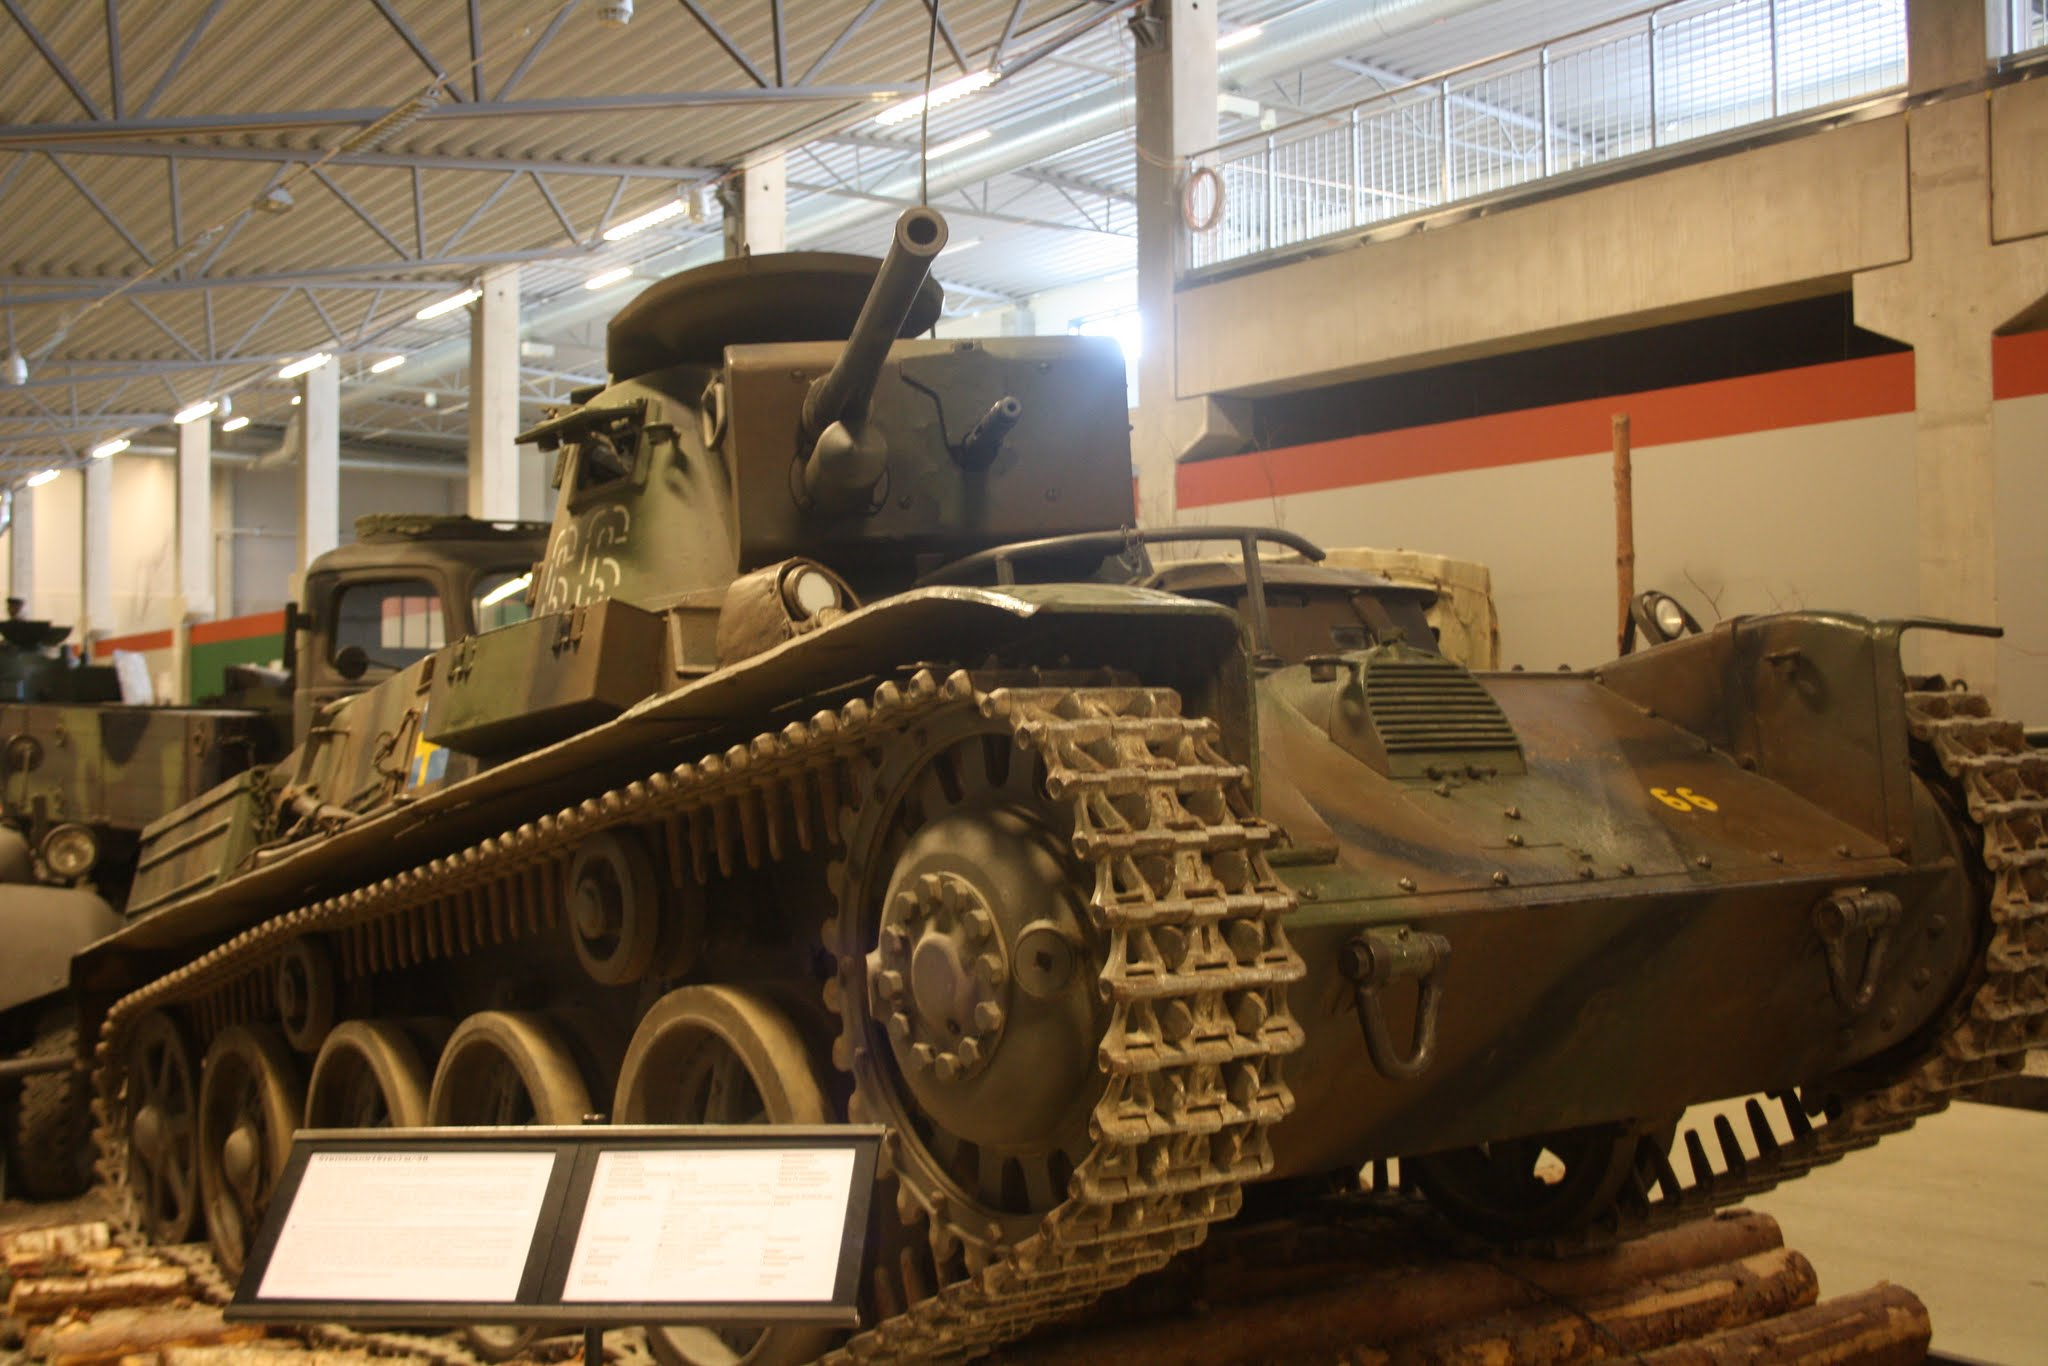 Strv m/38 в музее Arsenalen